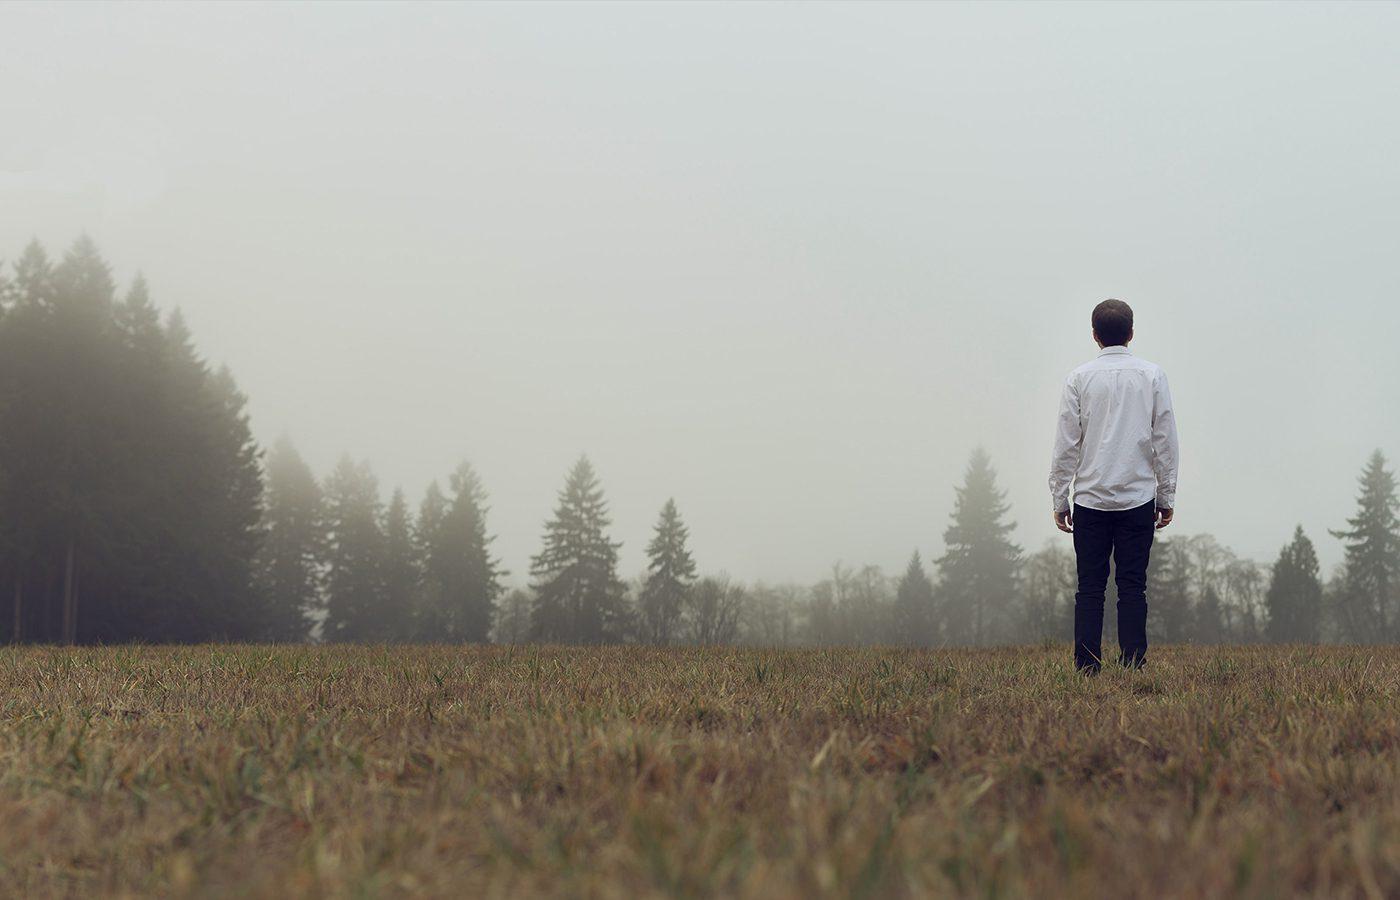 Reasoning Towards Repentance